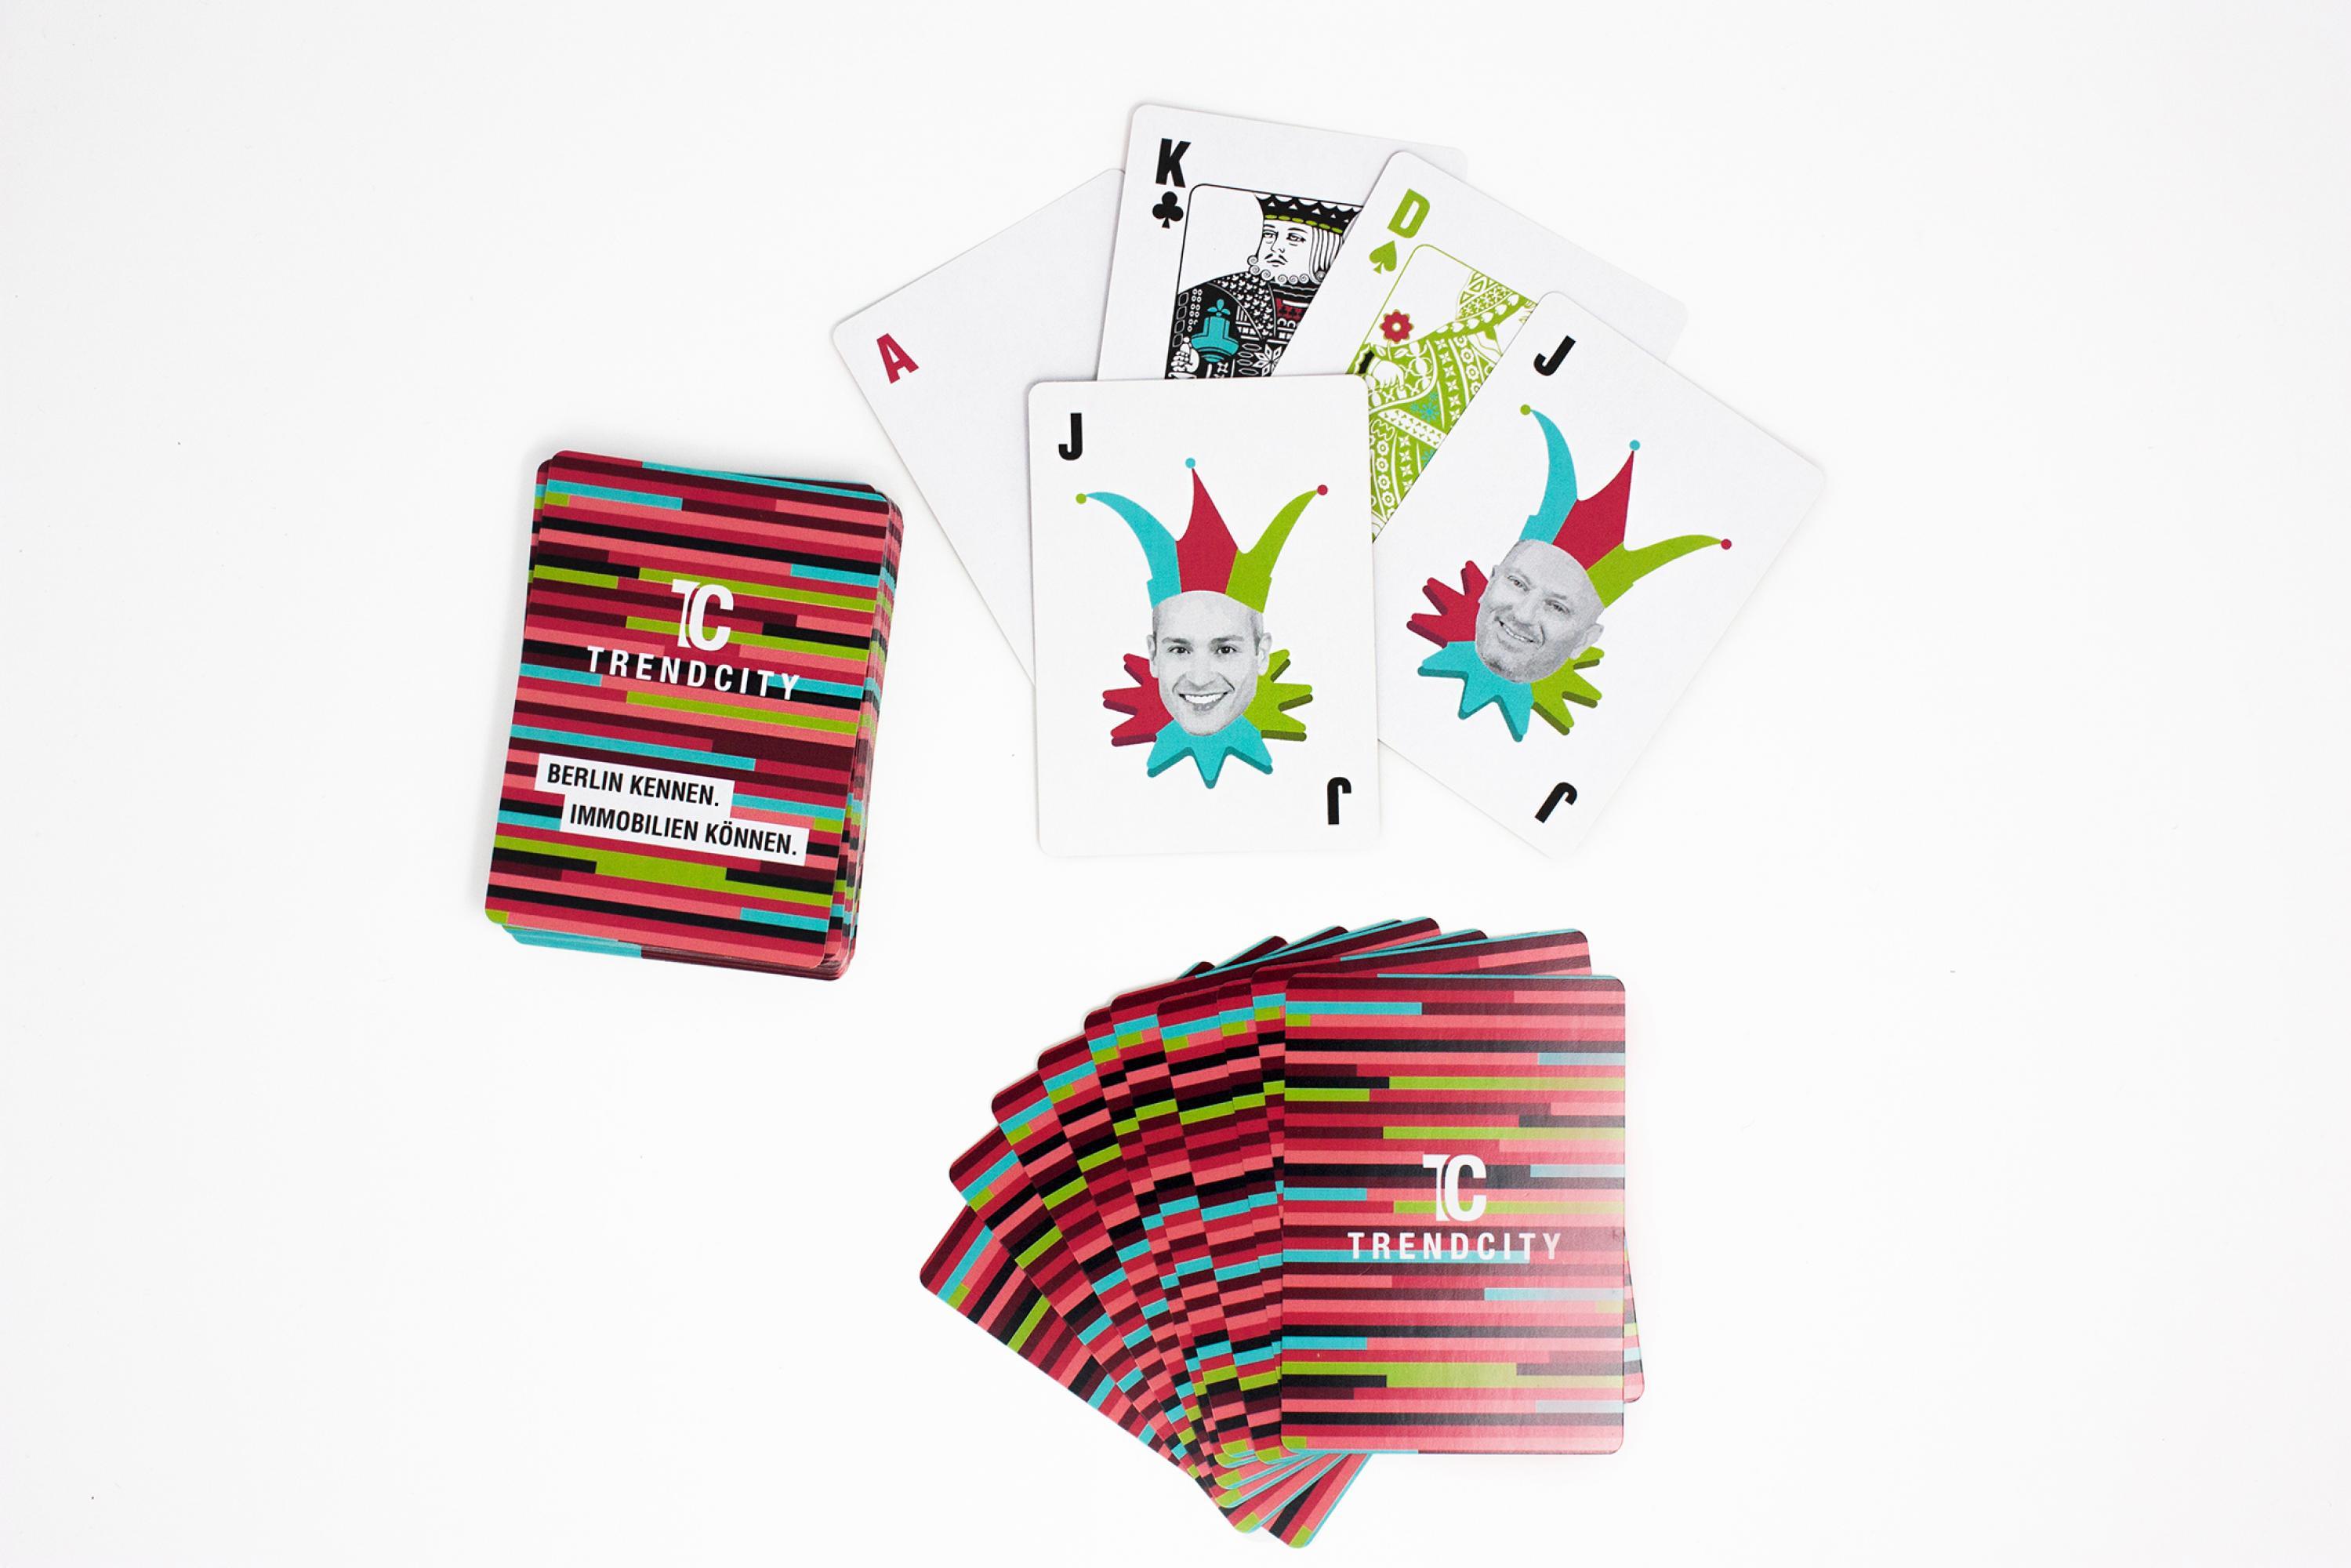 Pokerkarten-trendcity-formlos-corporate-design-print-6